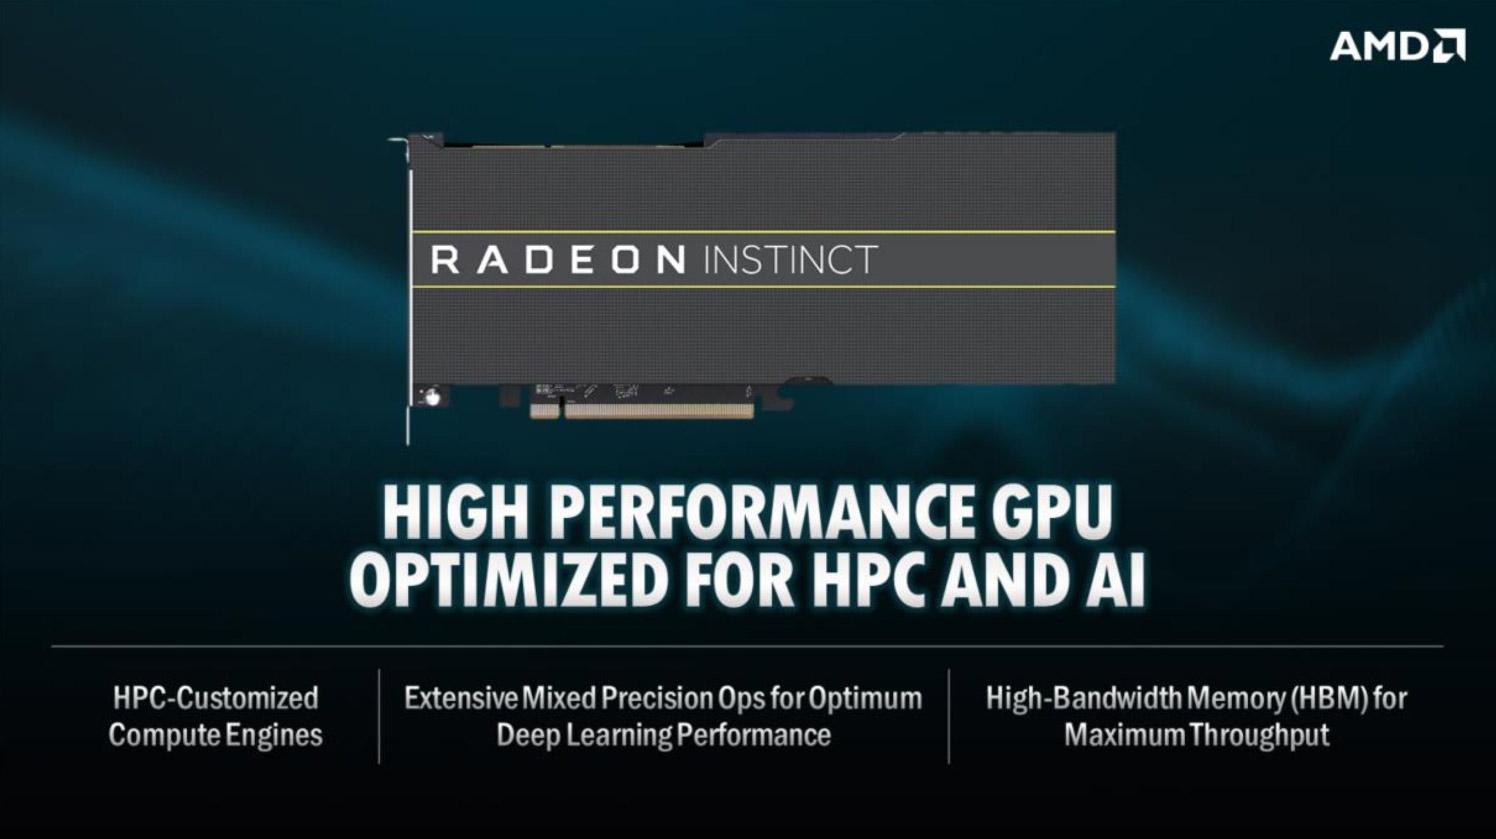 World's Fastest Supercomputer Will be Powered by AMD EPYC, Radeon Instinct - Processors 3